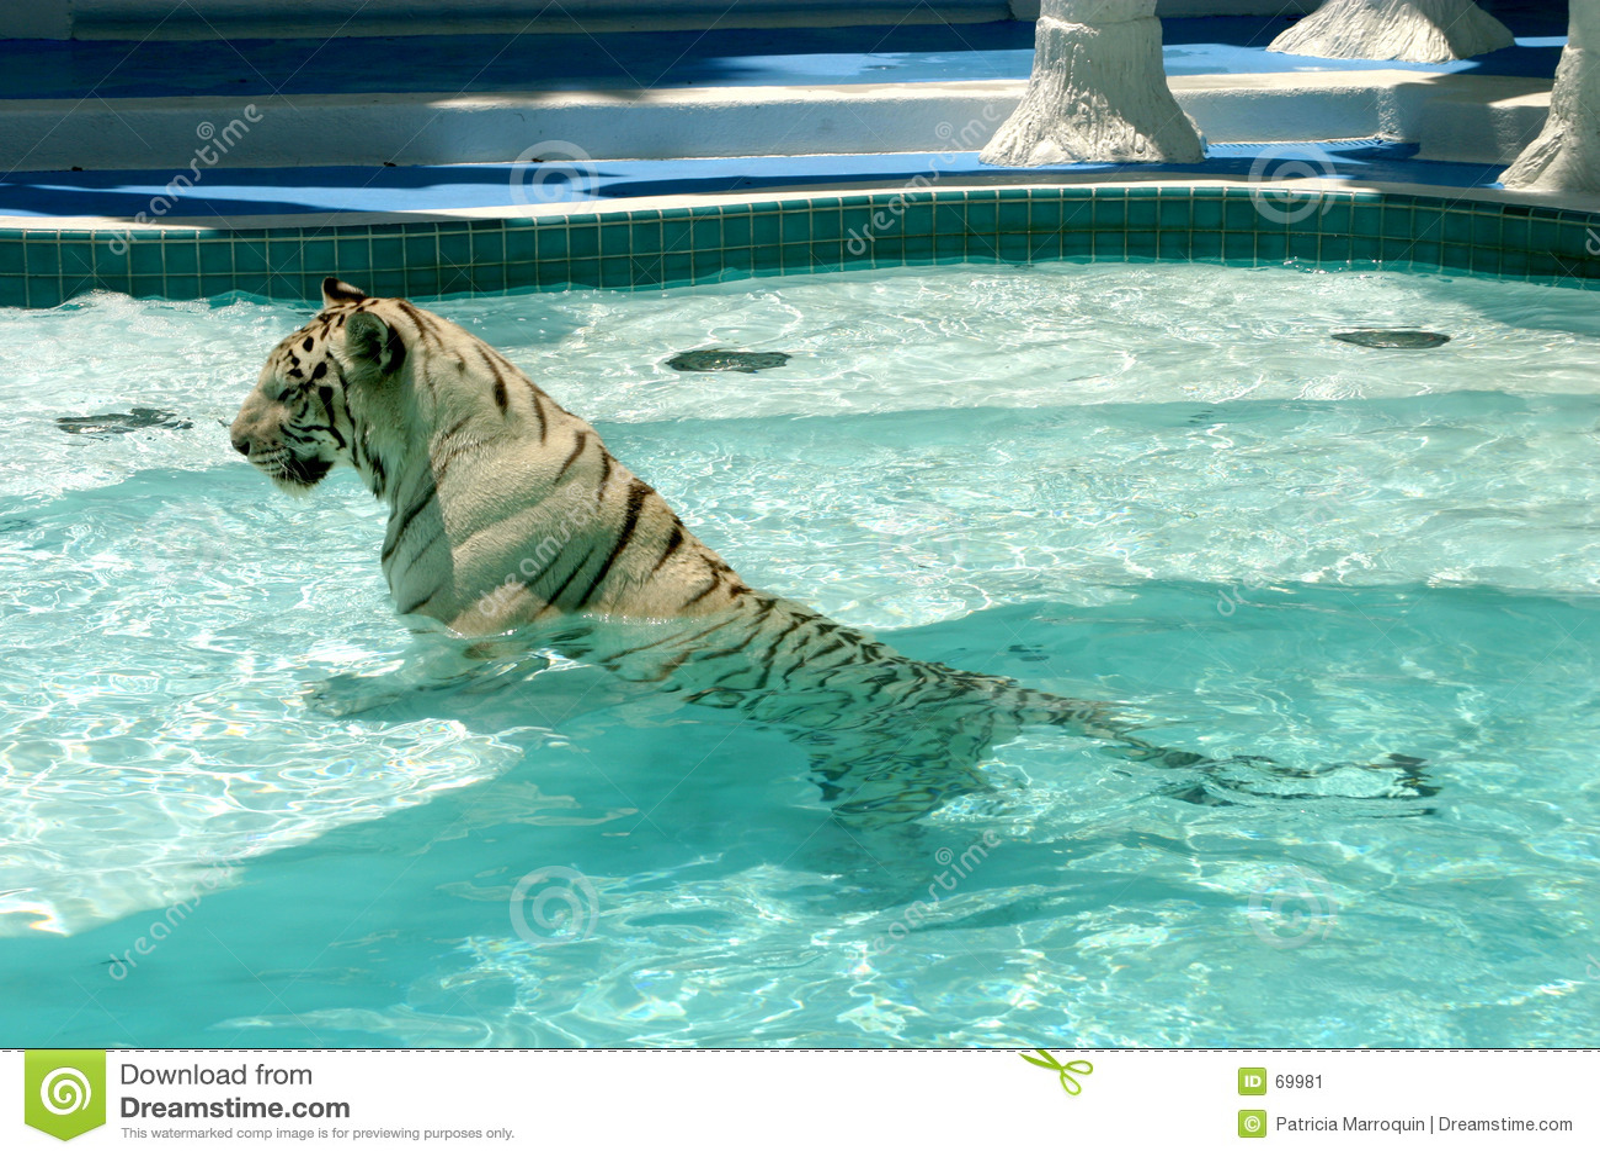 Regal White Tiger